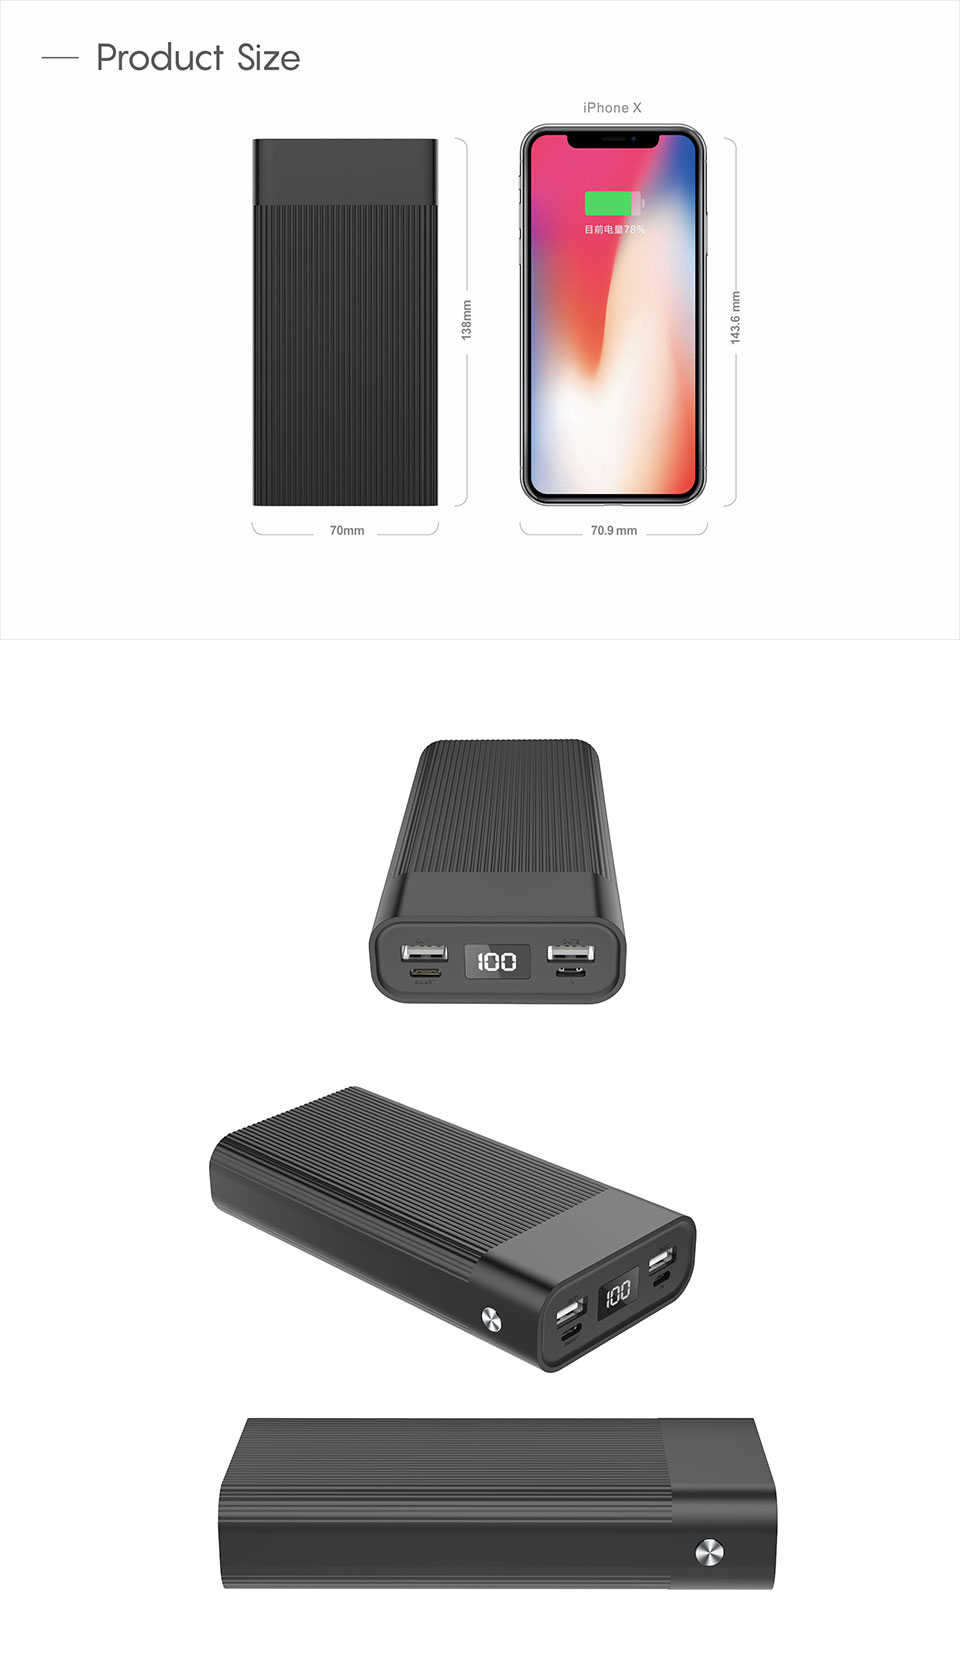 XiPin PX302 Dual Input Power Bank 20,000mAh product